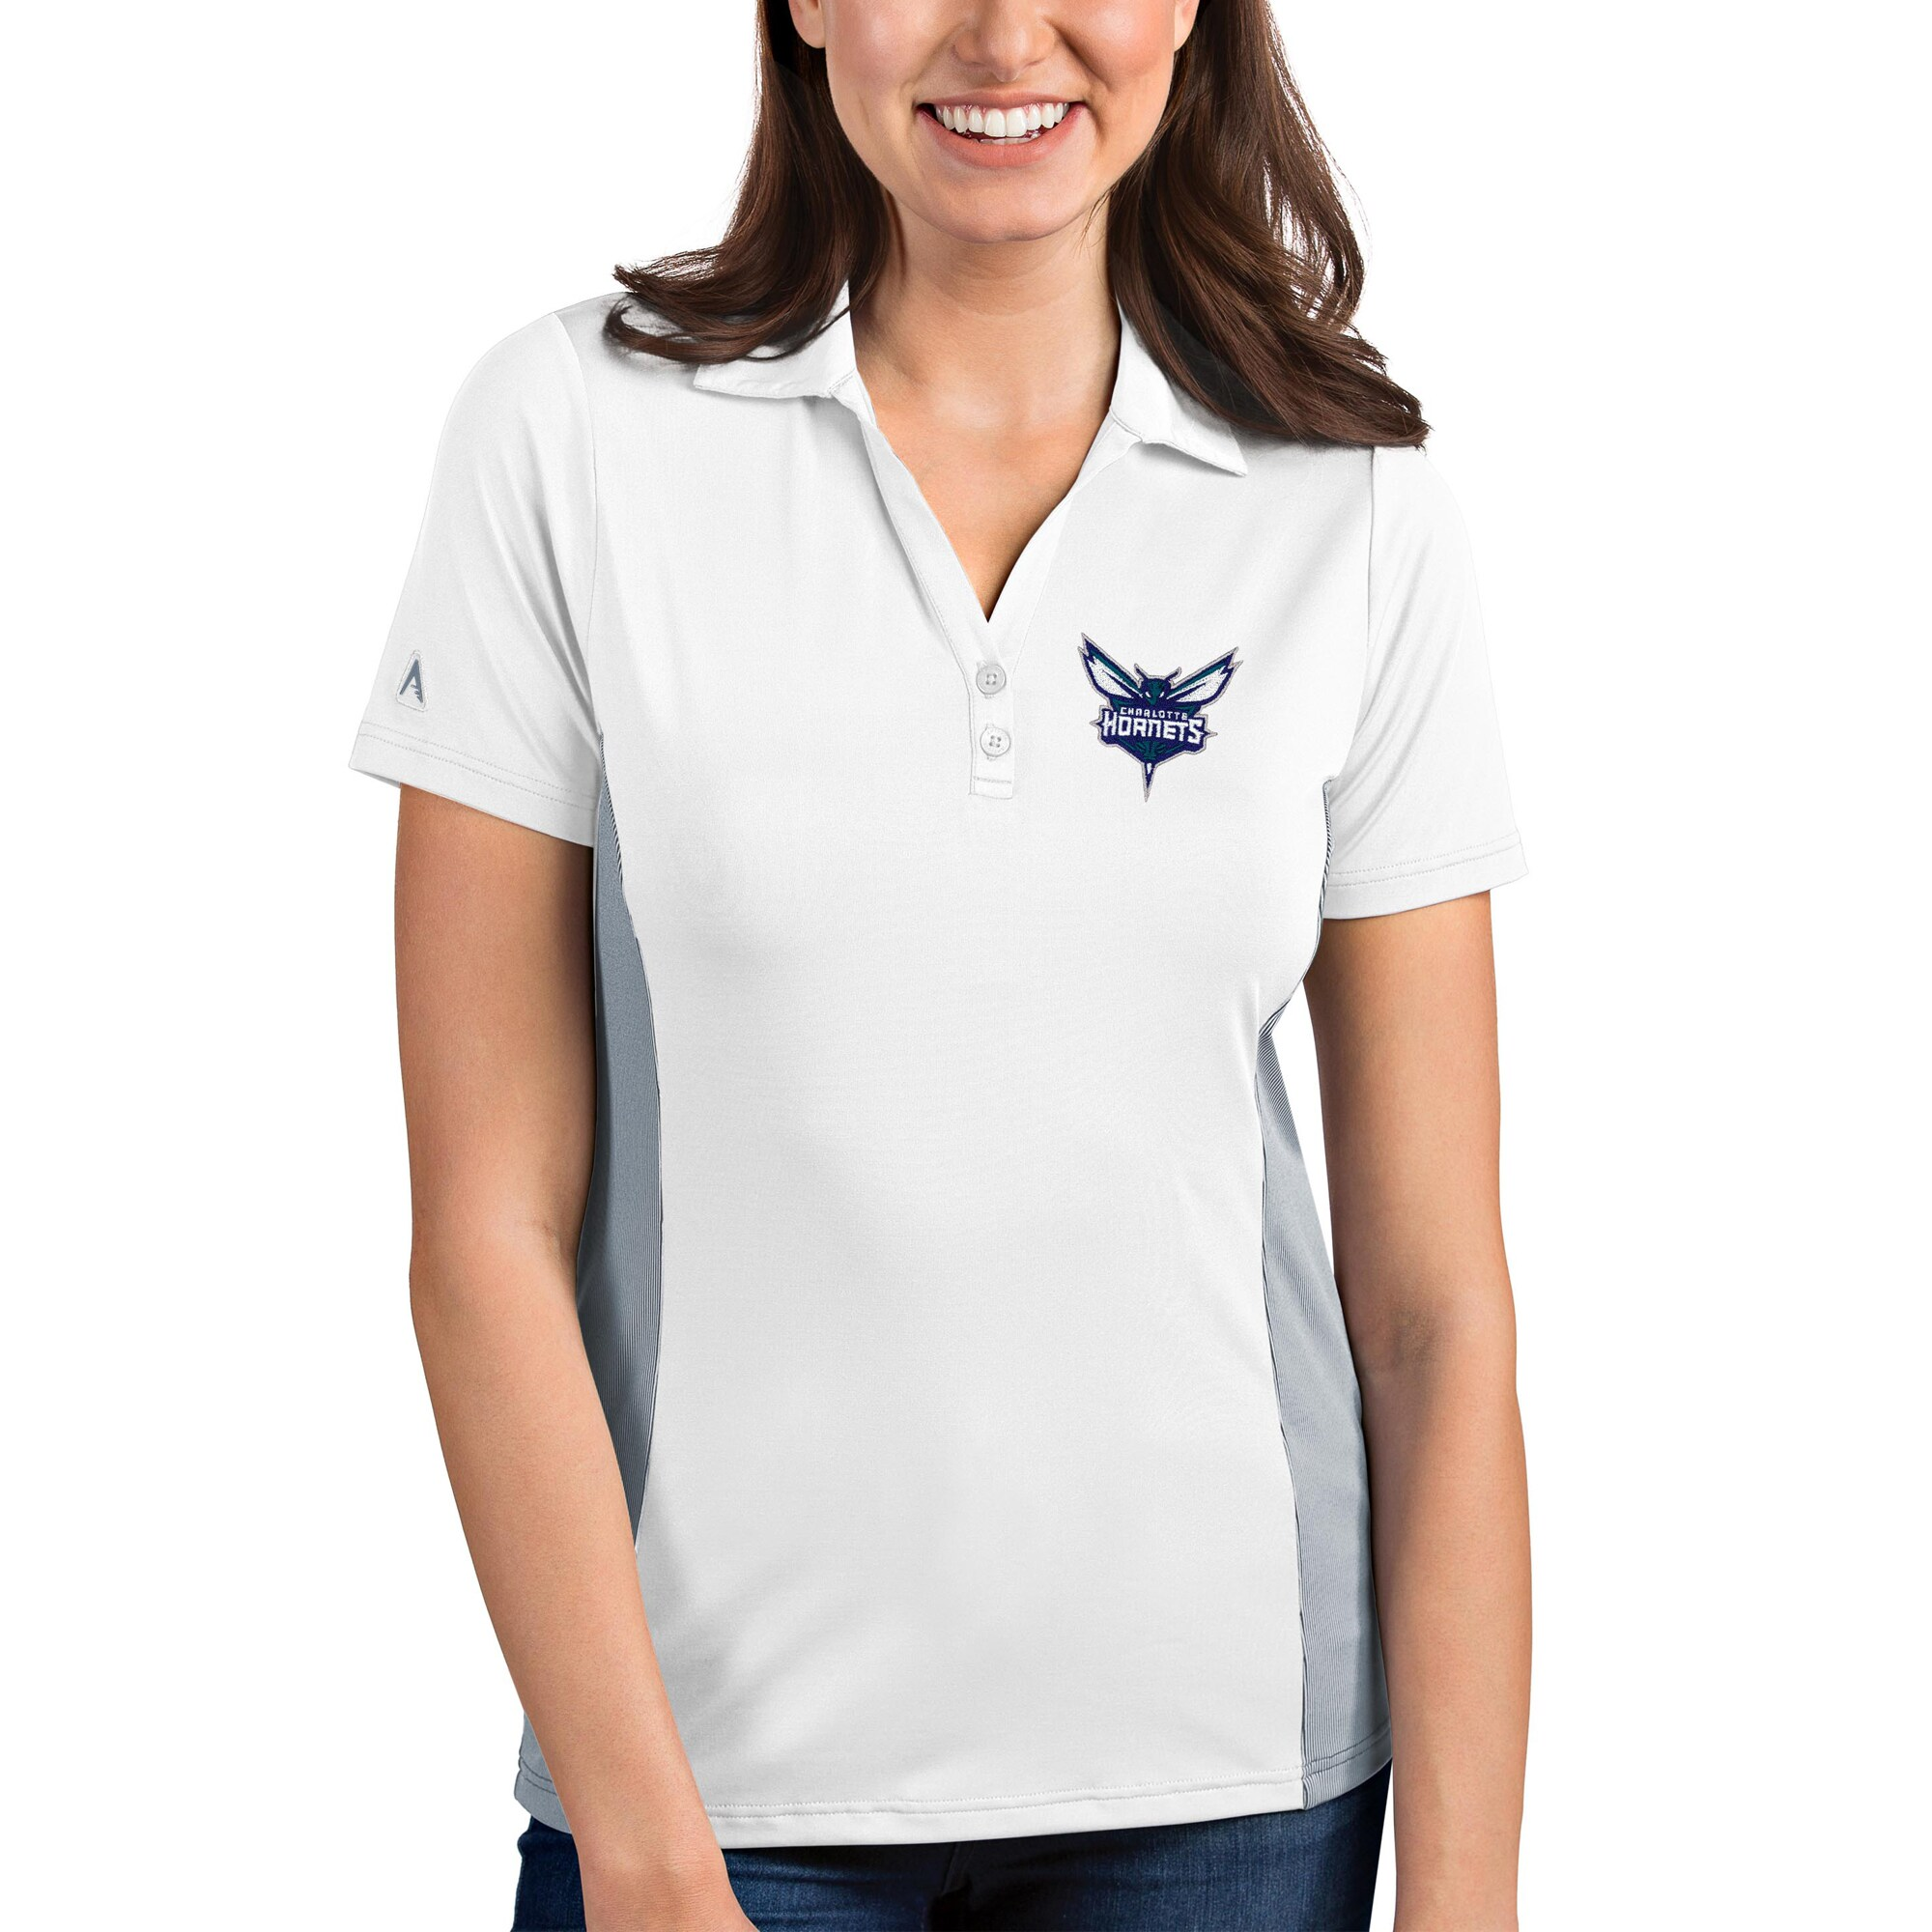 Charlotte Hornets Antigua Women's Venture Polo - White/Gray